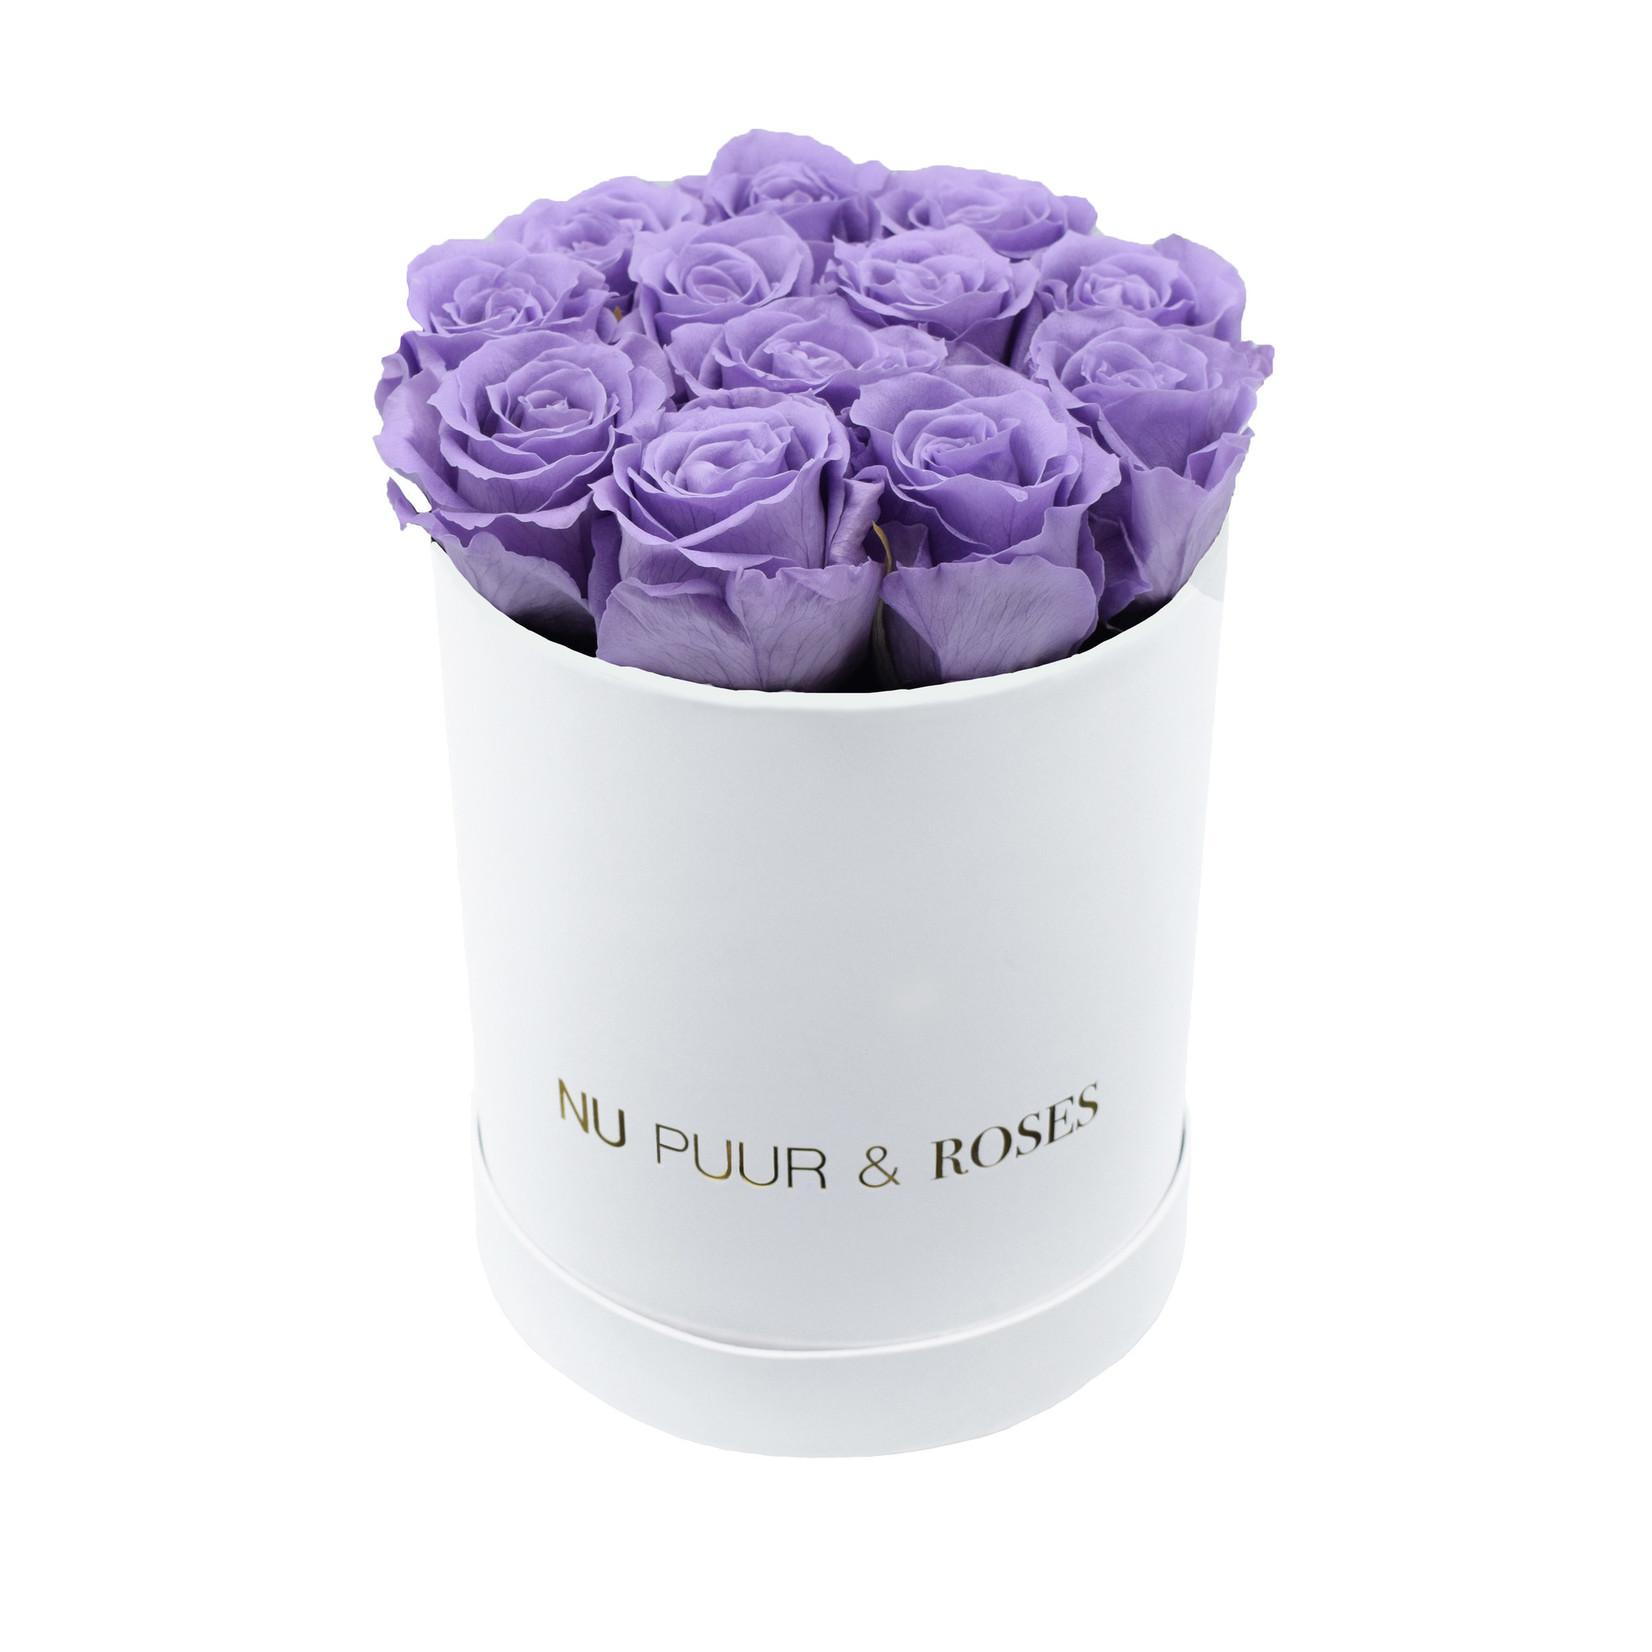 Small - Lilac Endless Roses - White Box